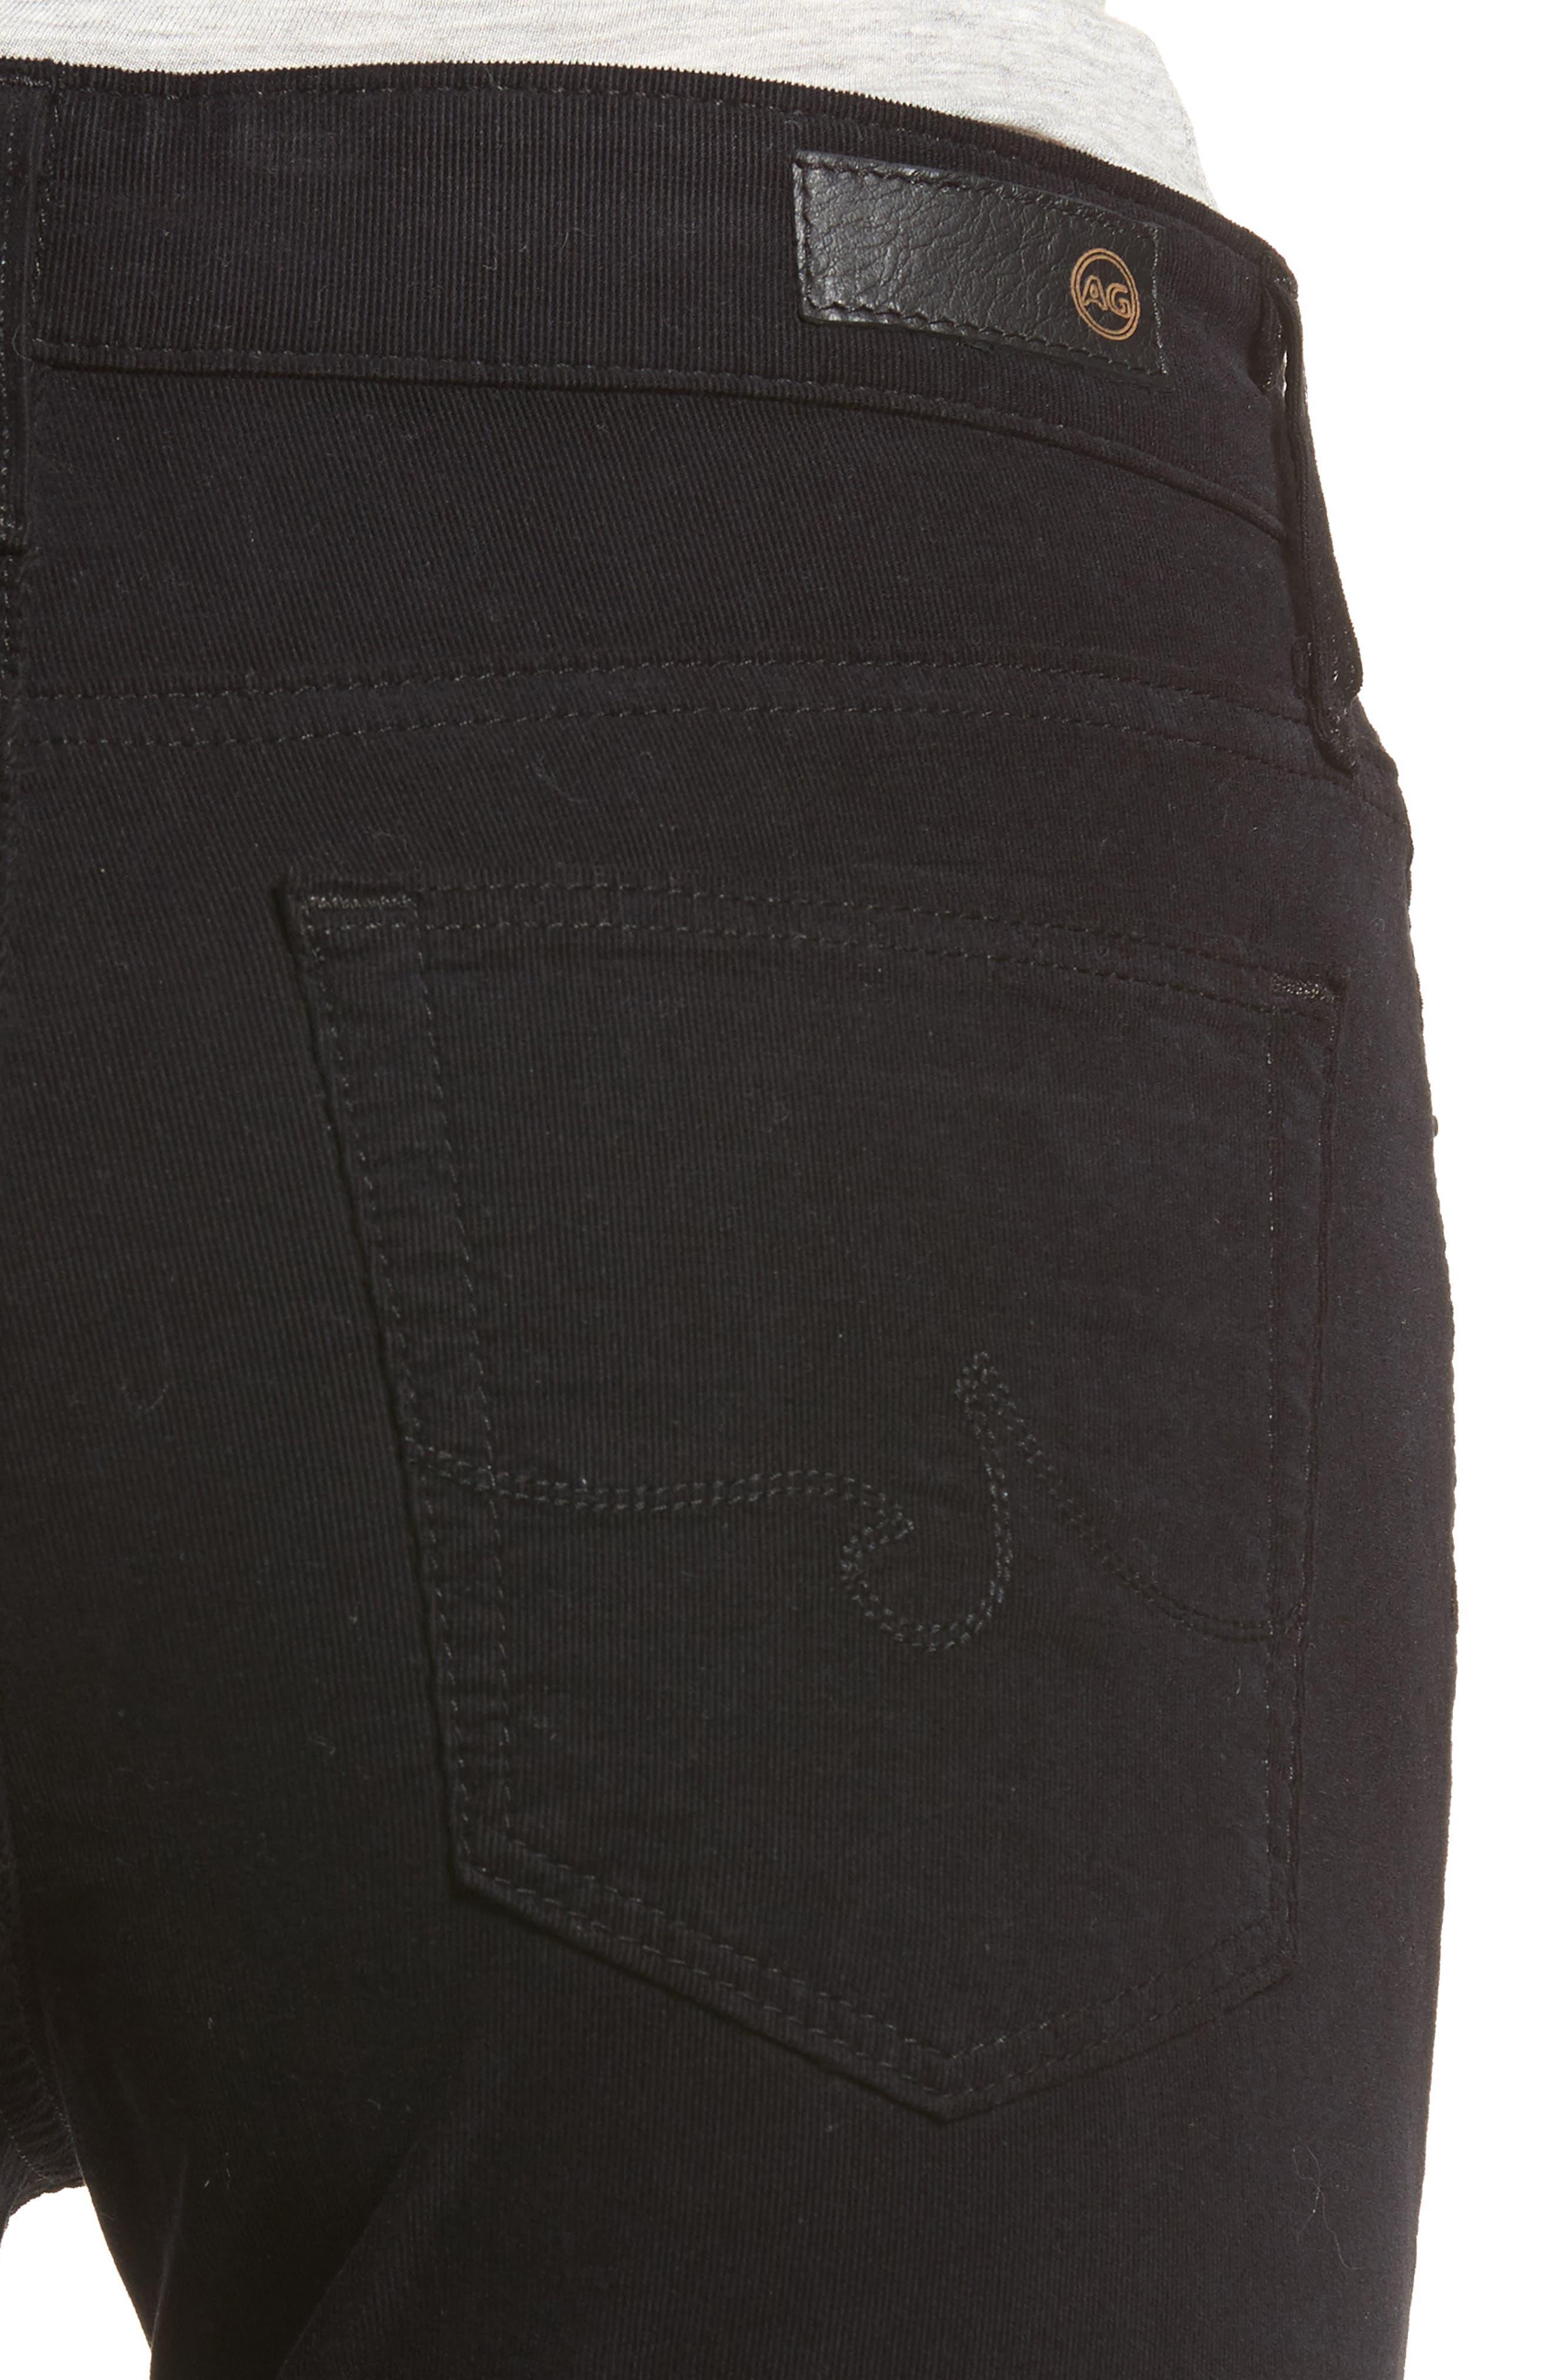 The Farrah High Waist Skinny Corduroy Pants,                             Alternate thumbnail 4, color,                             010